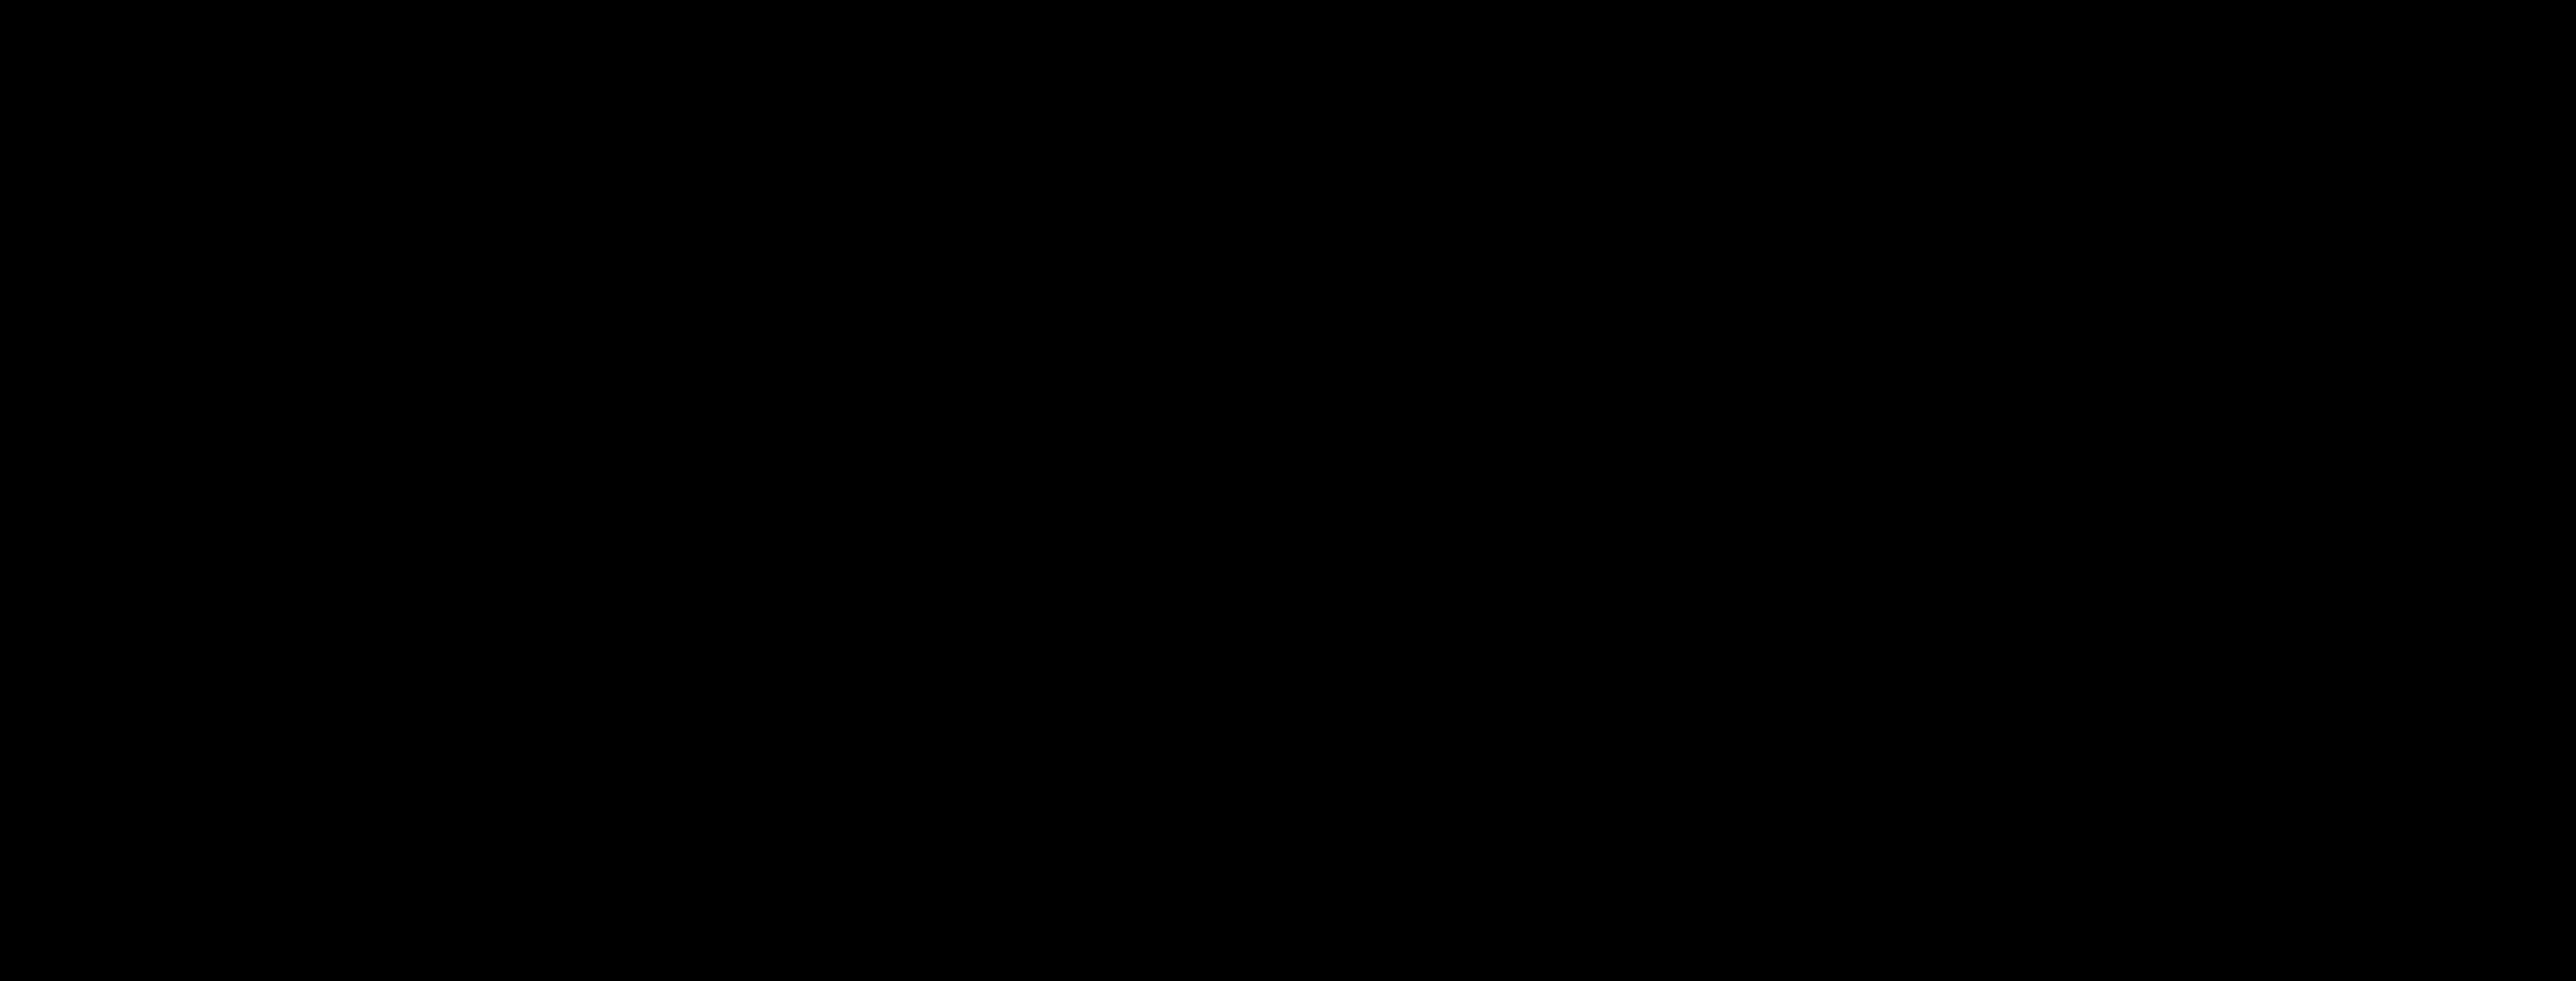 (N-Biotinyl-6-aminohexyl)-7-hydroxycoumarin-4-acetamide